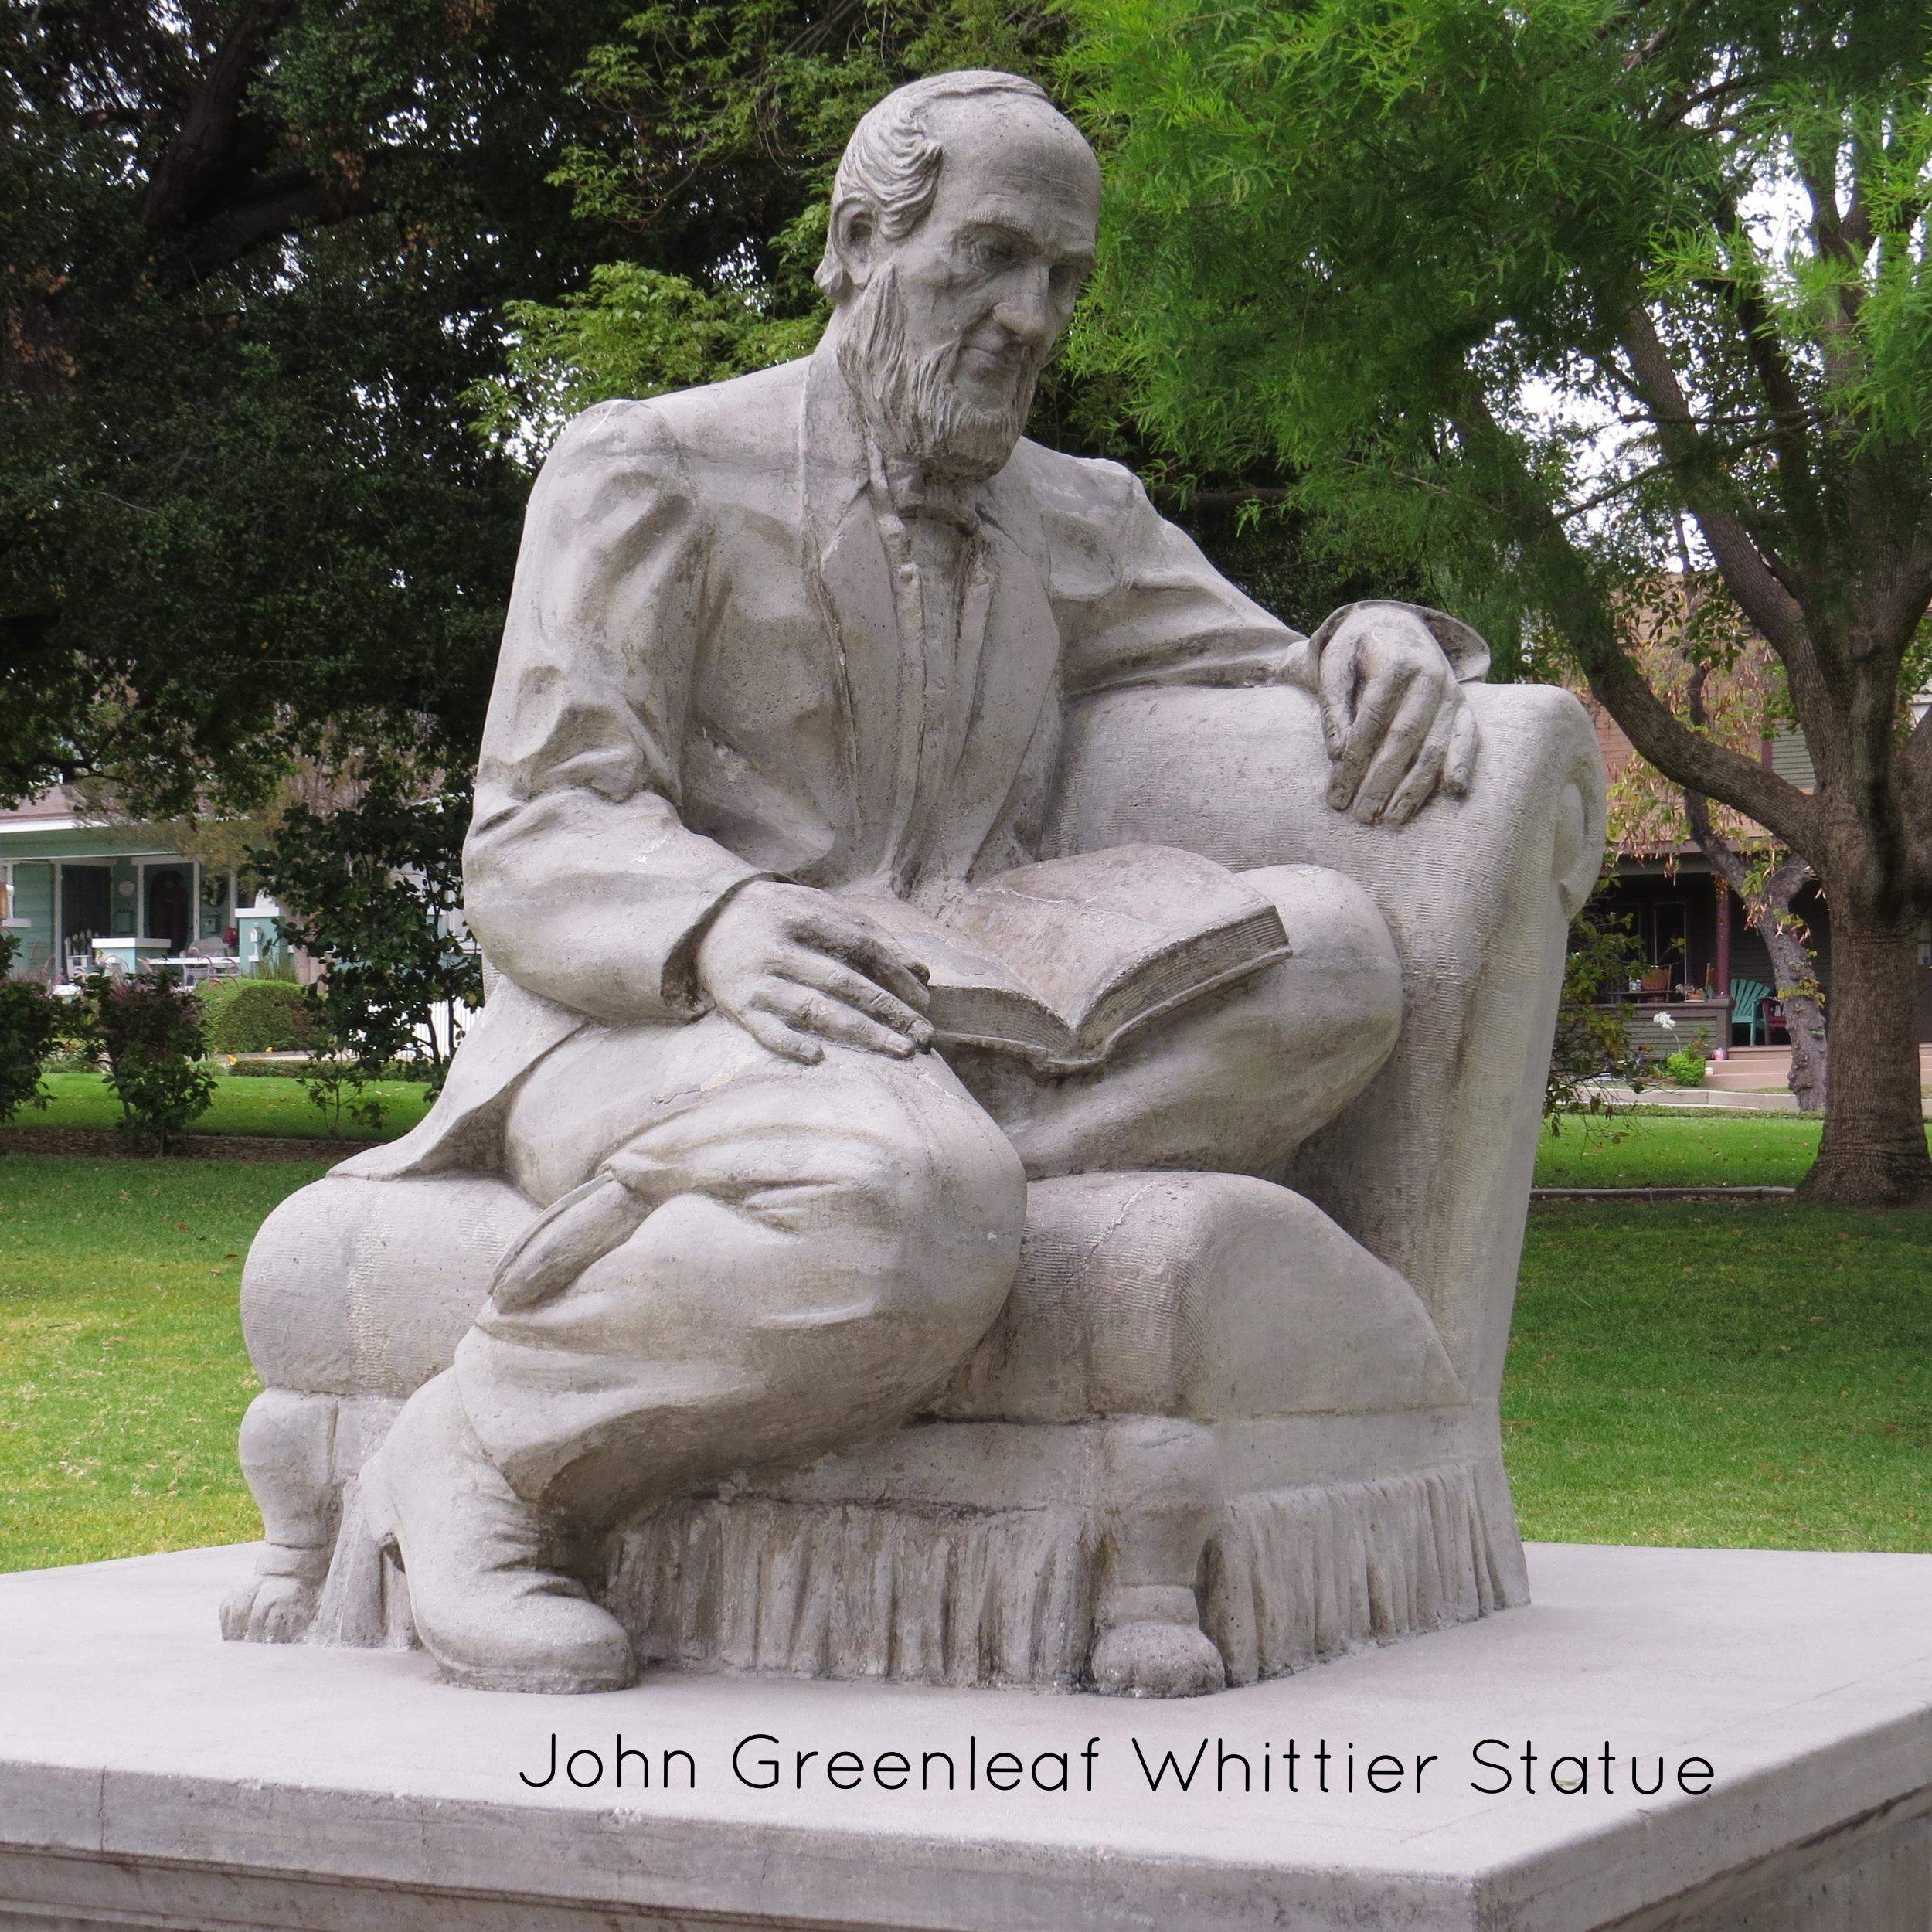 John Greenleaf Whittier Statue.jpg